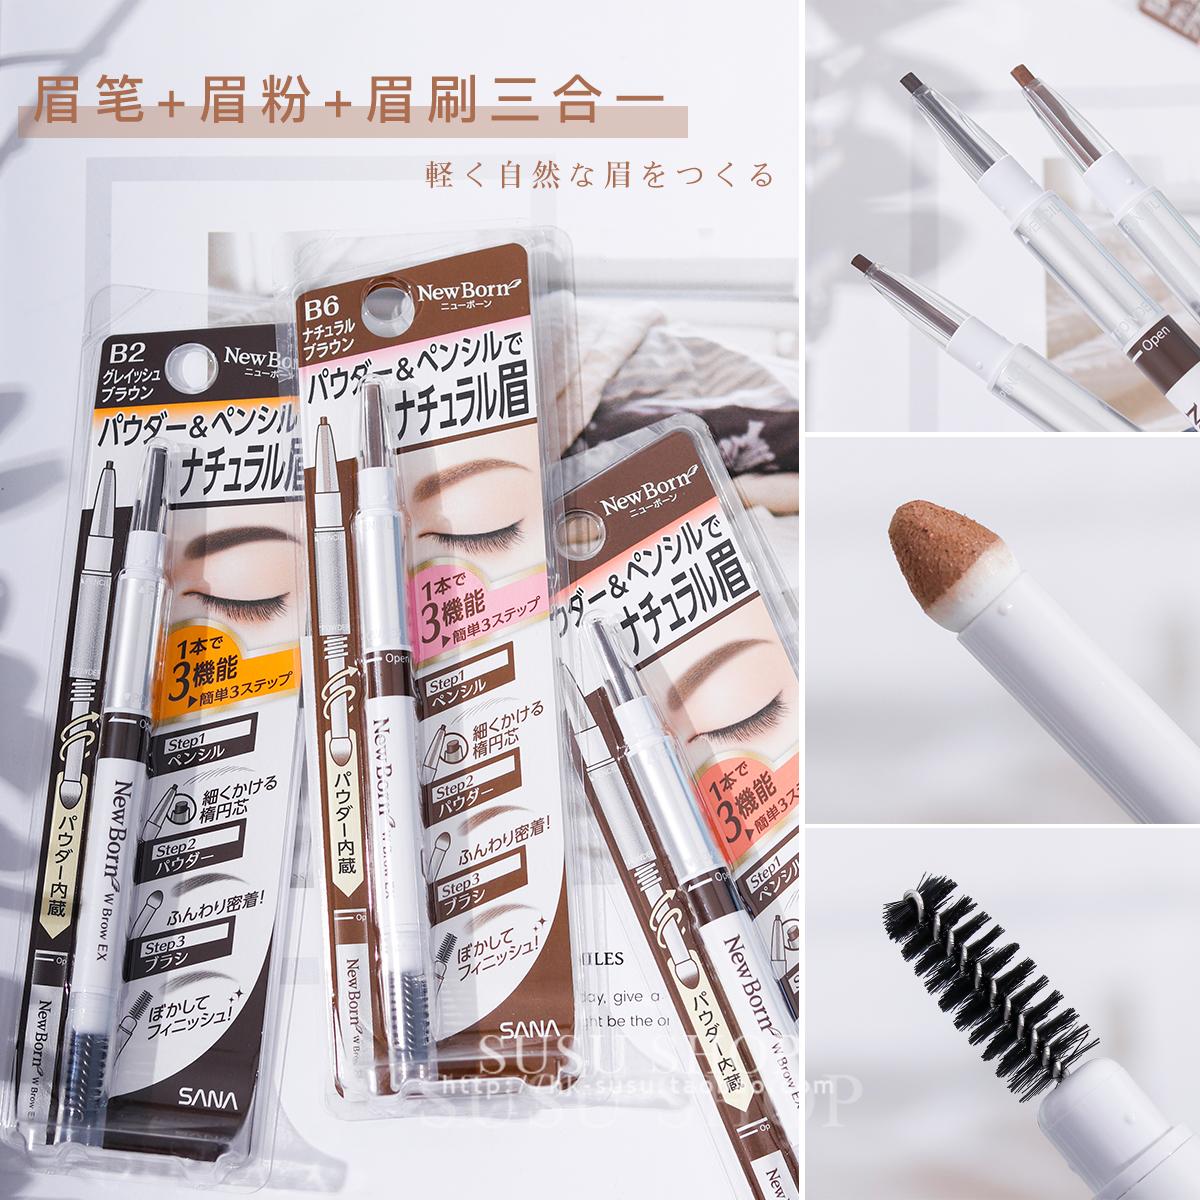 COSME大赏 日本sana莎娜眉笔眉粉眉刷三合一防水耐汗持久自然柔和图片